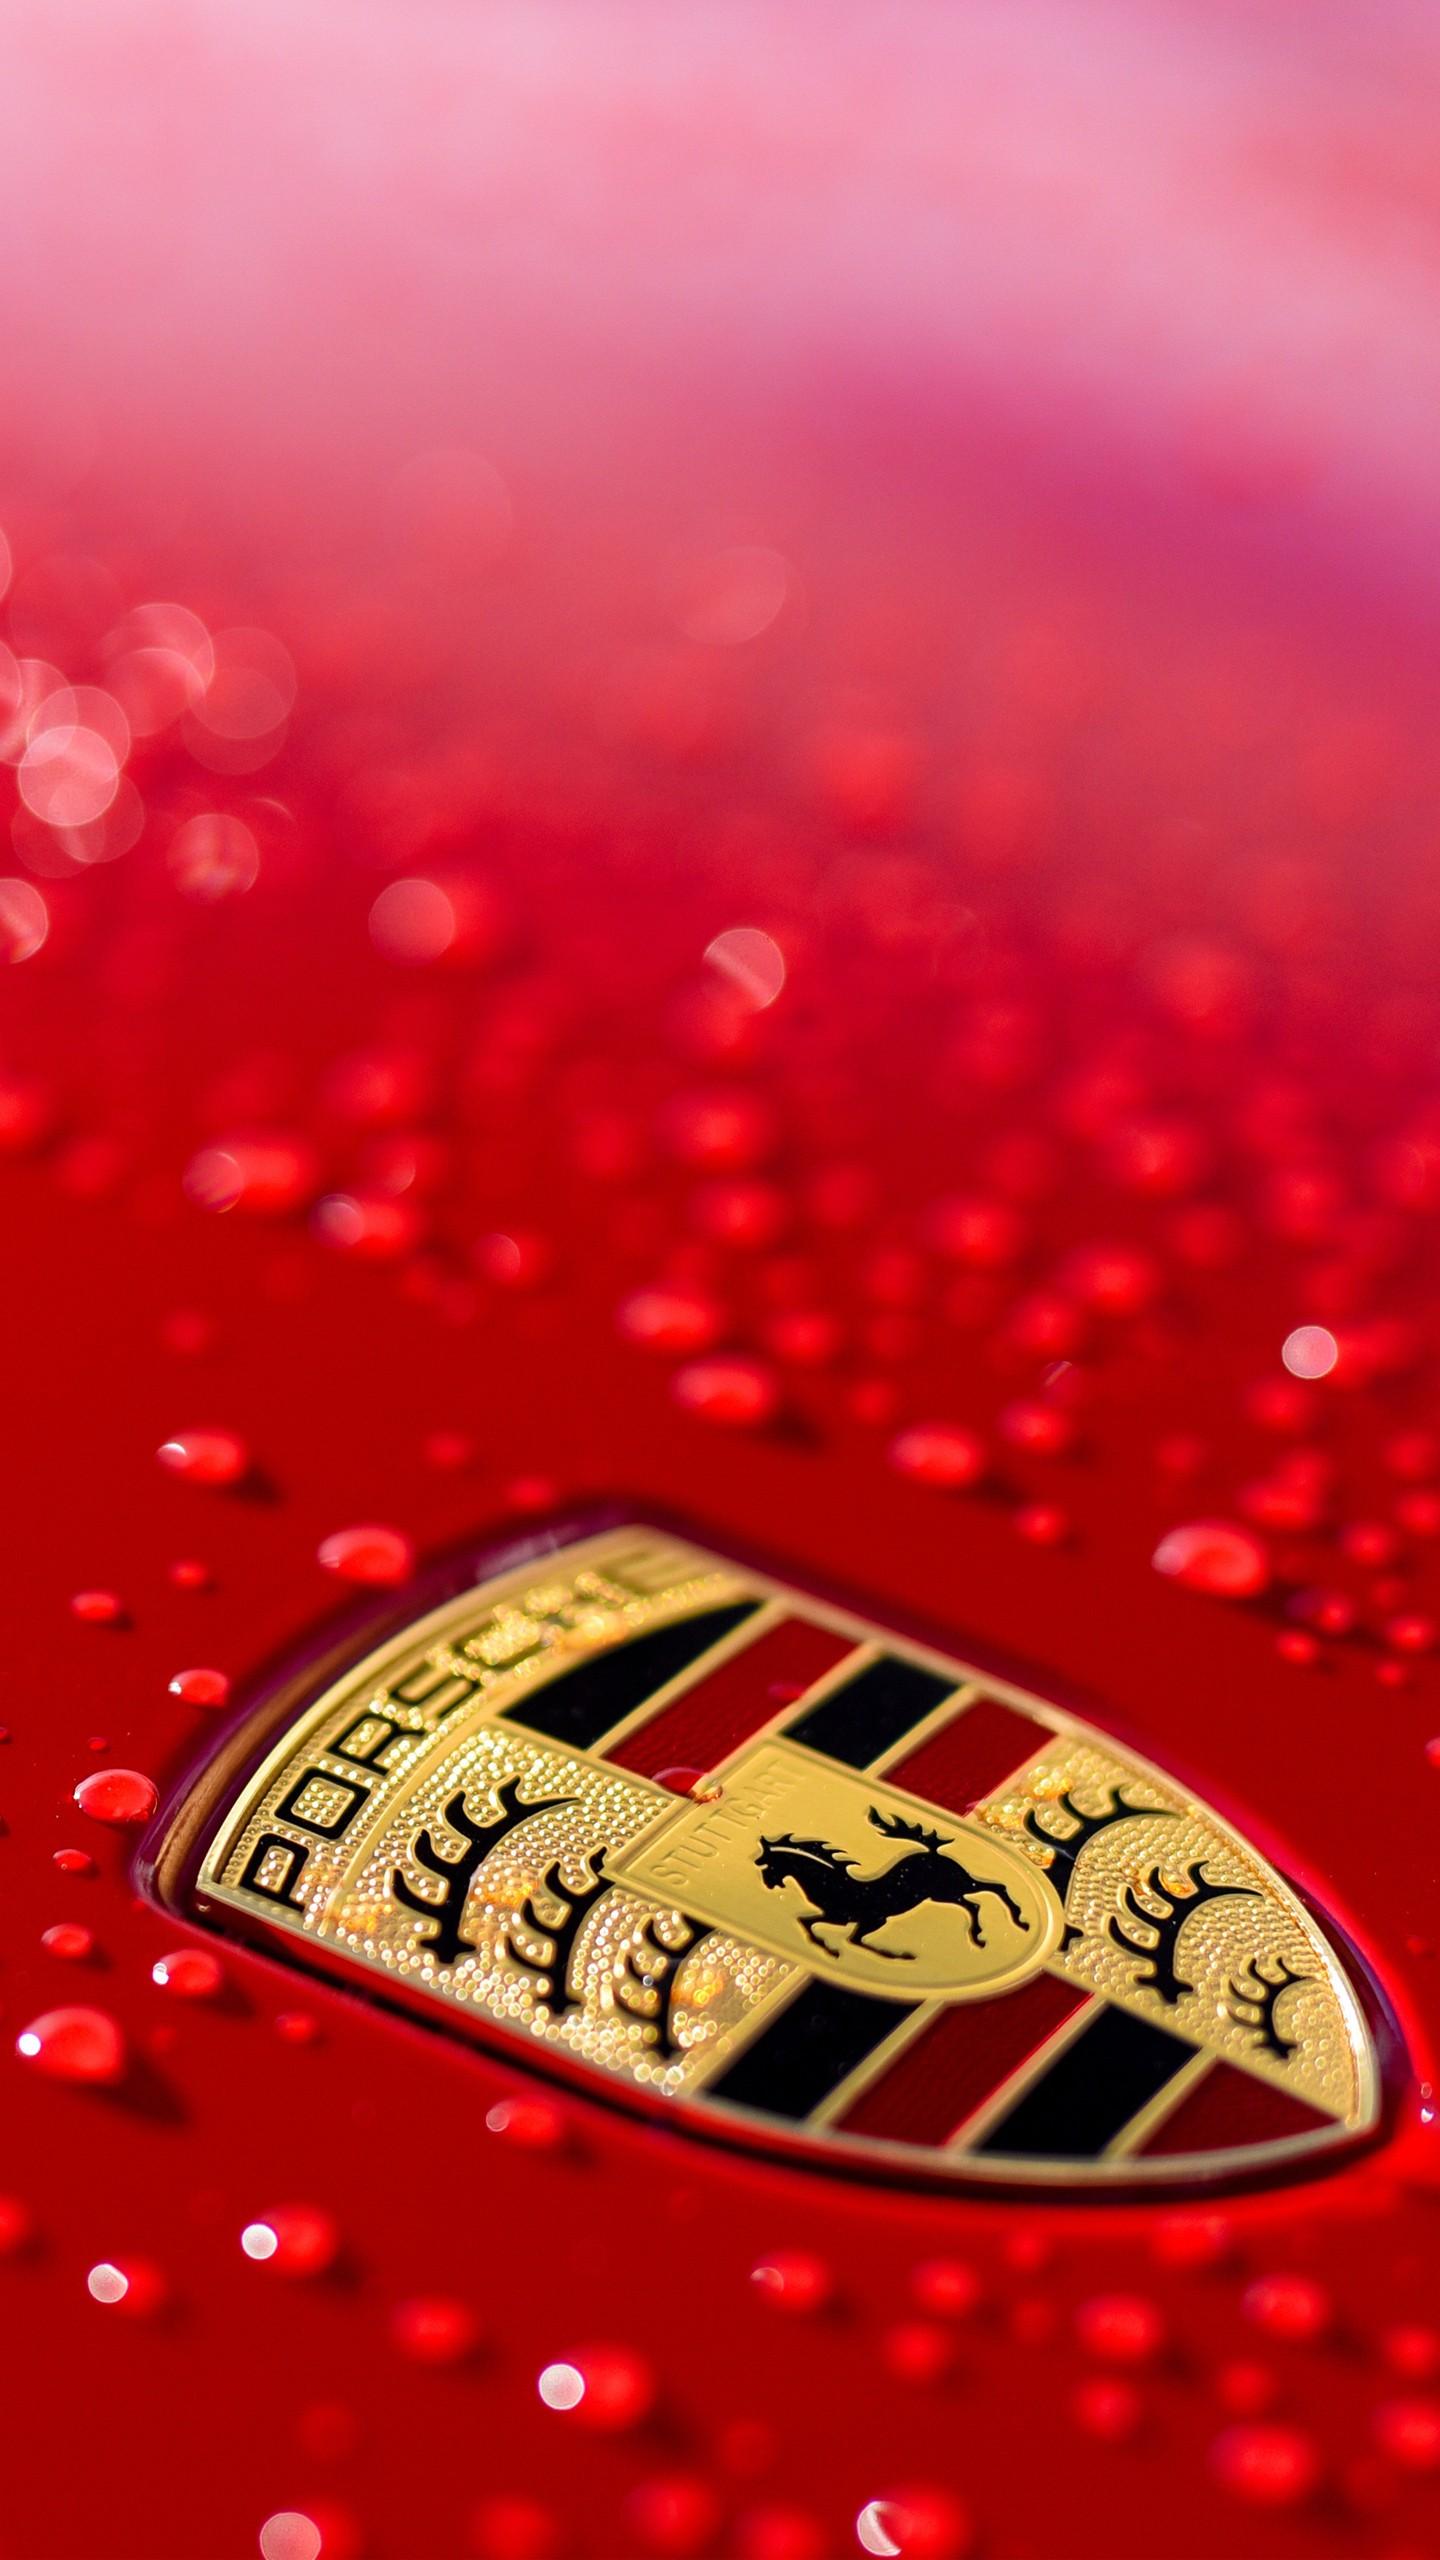 Iphone 5s Retina Wallpaper Porsche Logo Hd 4k Wallpapers Hd Wallpapers Id 22705